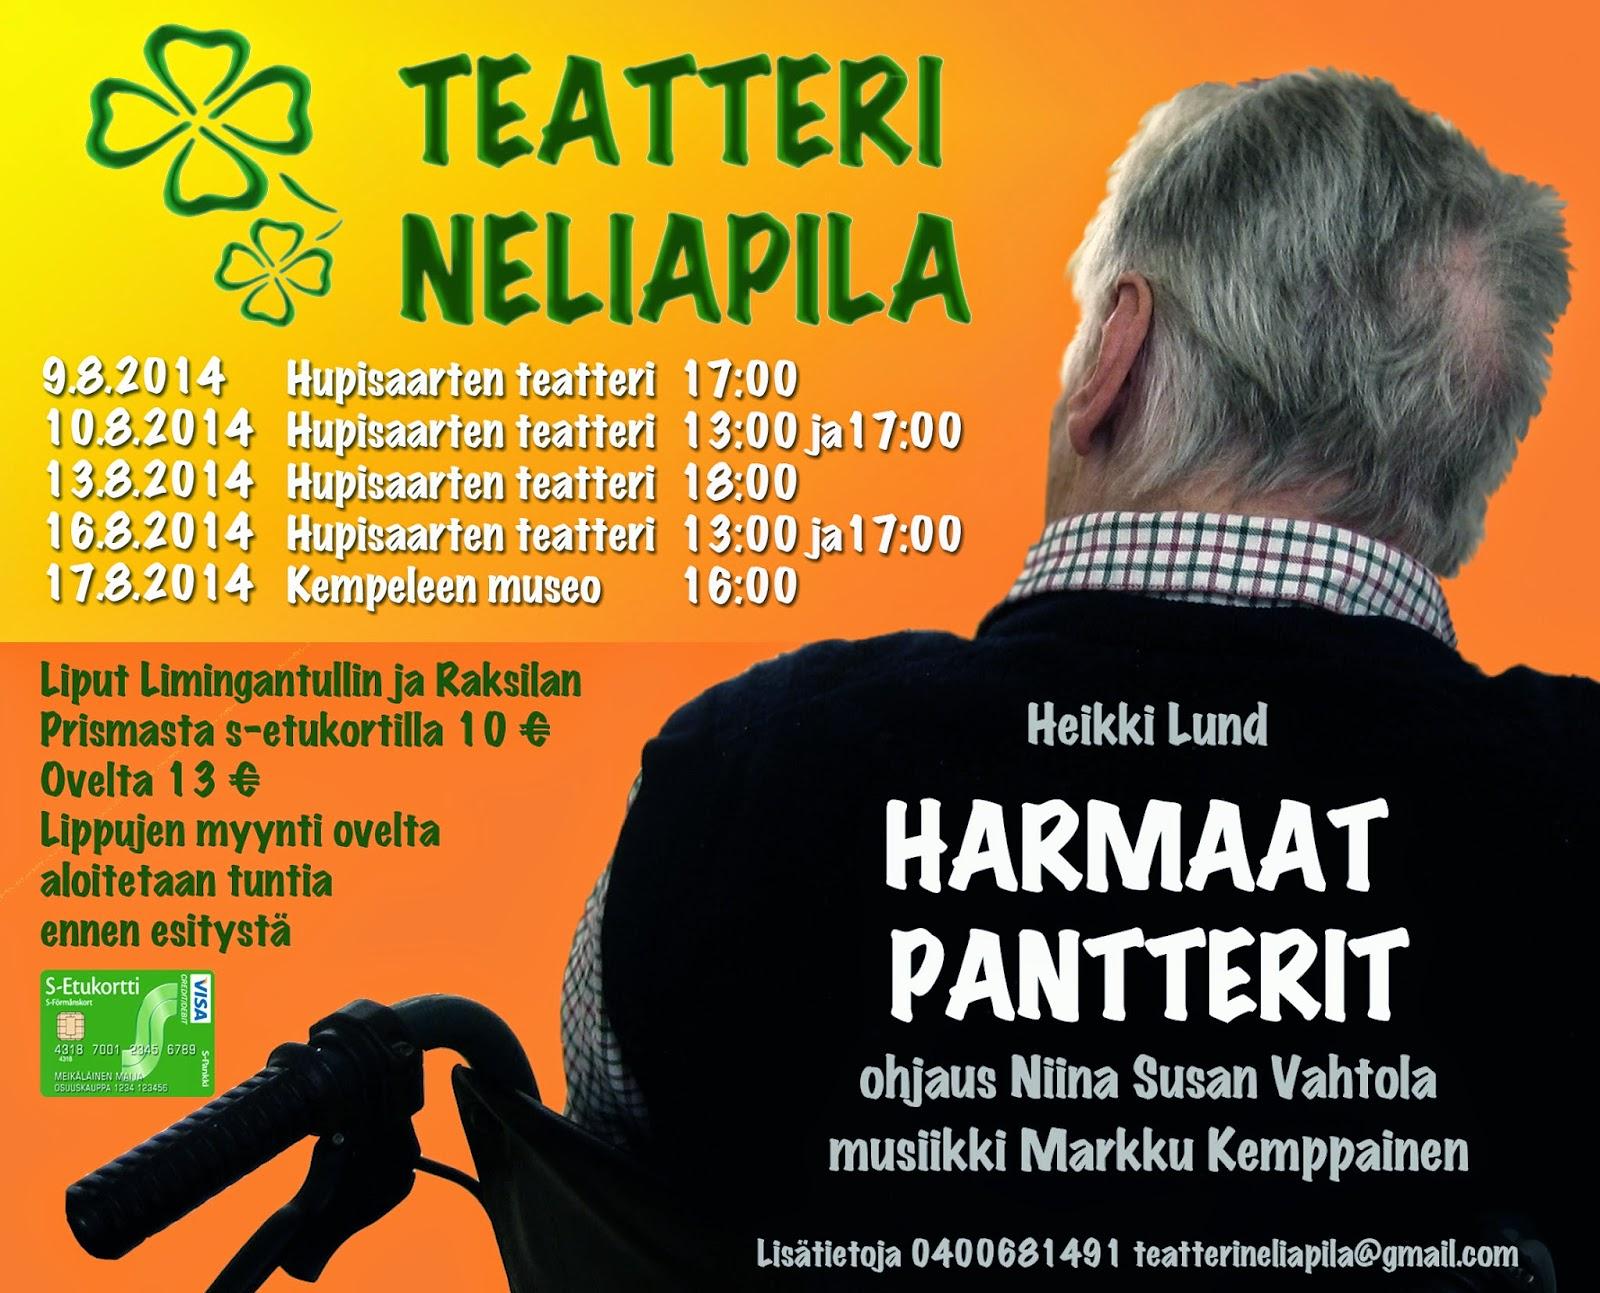 Teatteri Neliapila